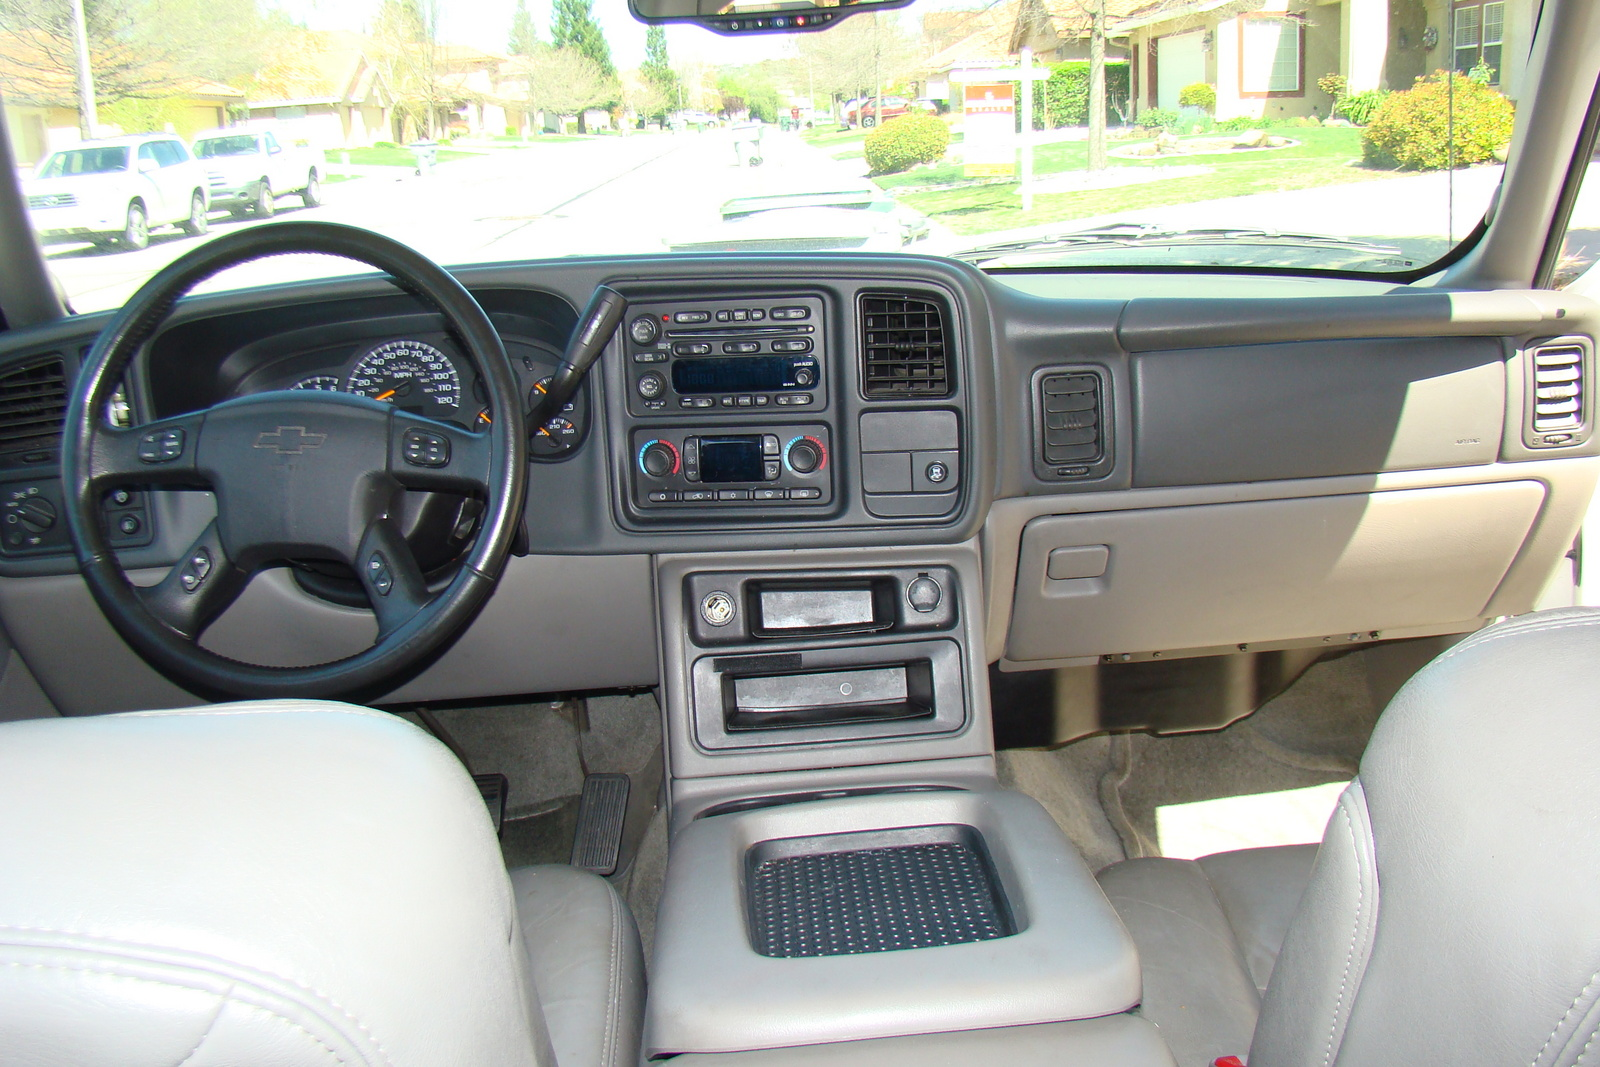 2012 Chrysler 300 Fuse Box together with M45 Fuse Diagram also Hyundai Santa Fe Radio Wiring Diagram additionally 2011 Dodge Ram 2500 Fuse Box Diagram Wiring Diagrams also Discussion C5394 ds757735. on 2005 sebring sedan fuse box …